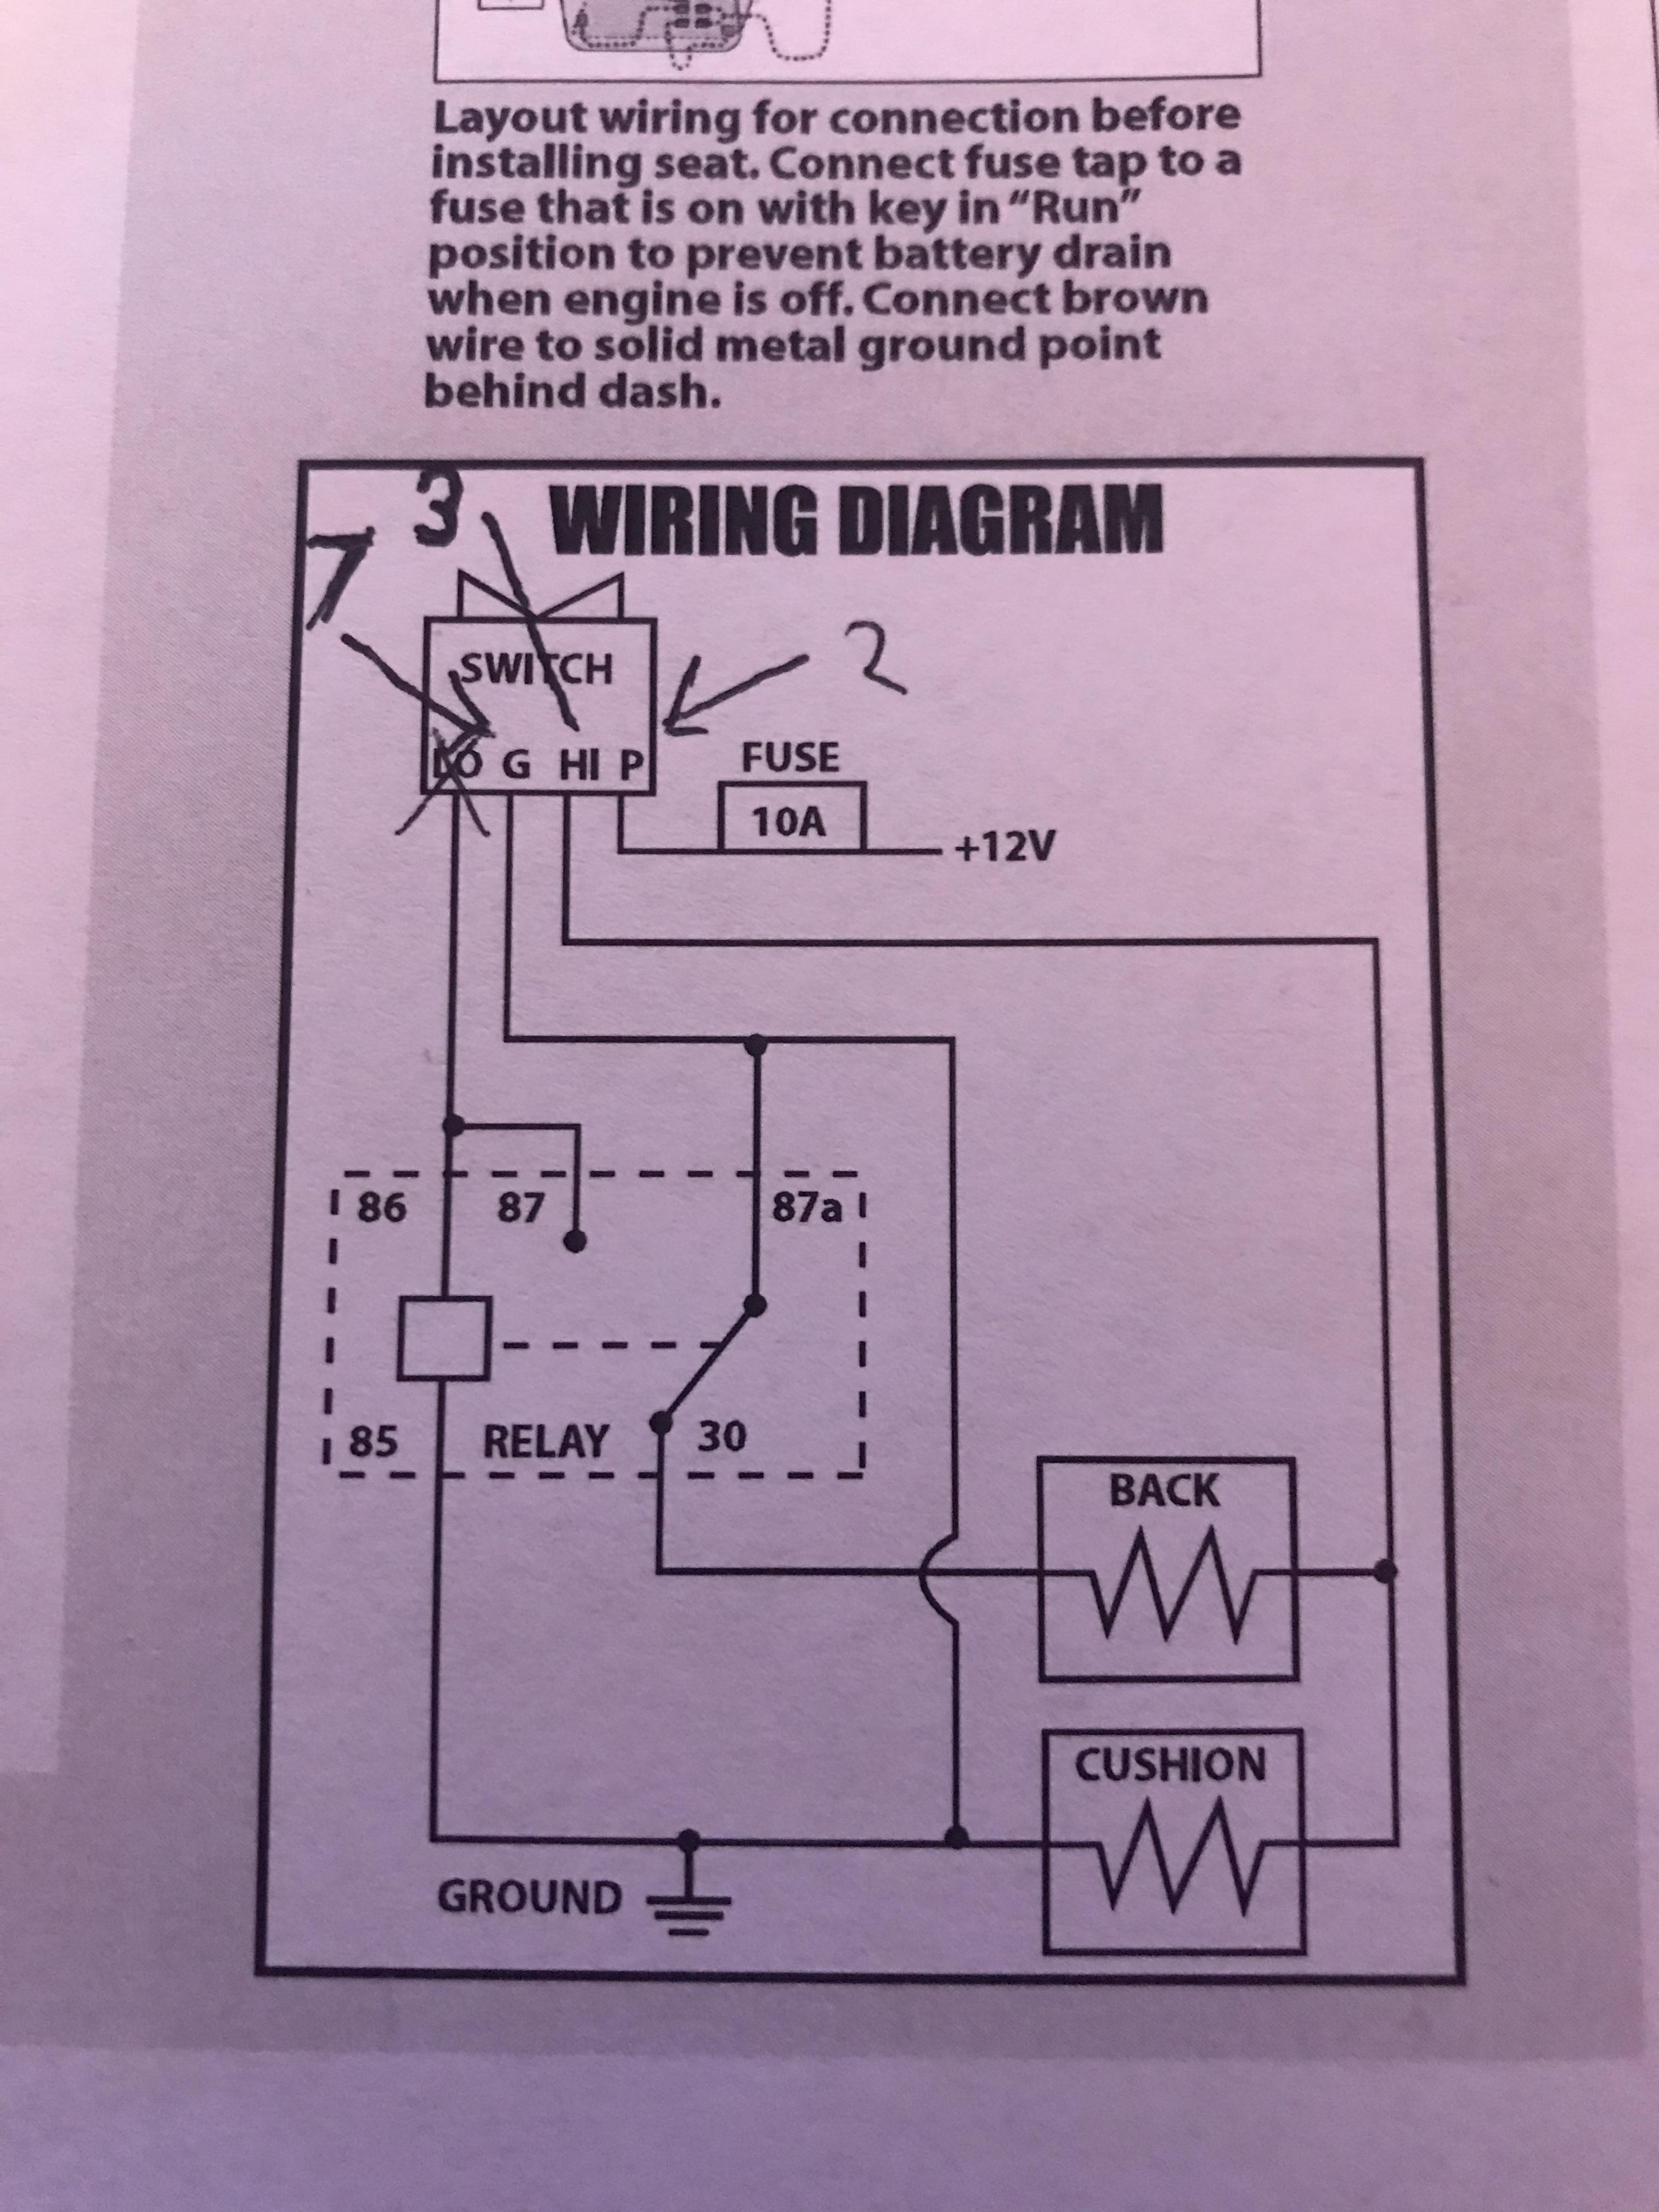 Wiring Help Please Heated Seats Can Am Maverick Forum